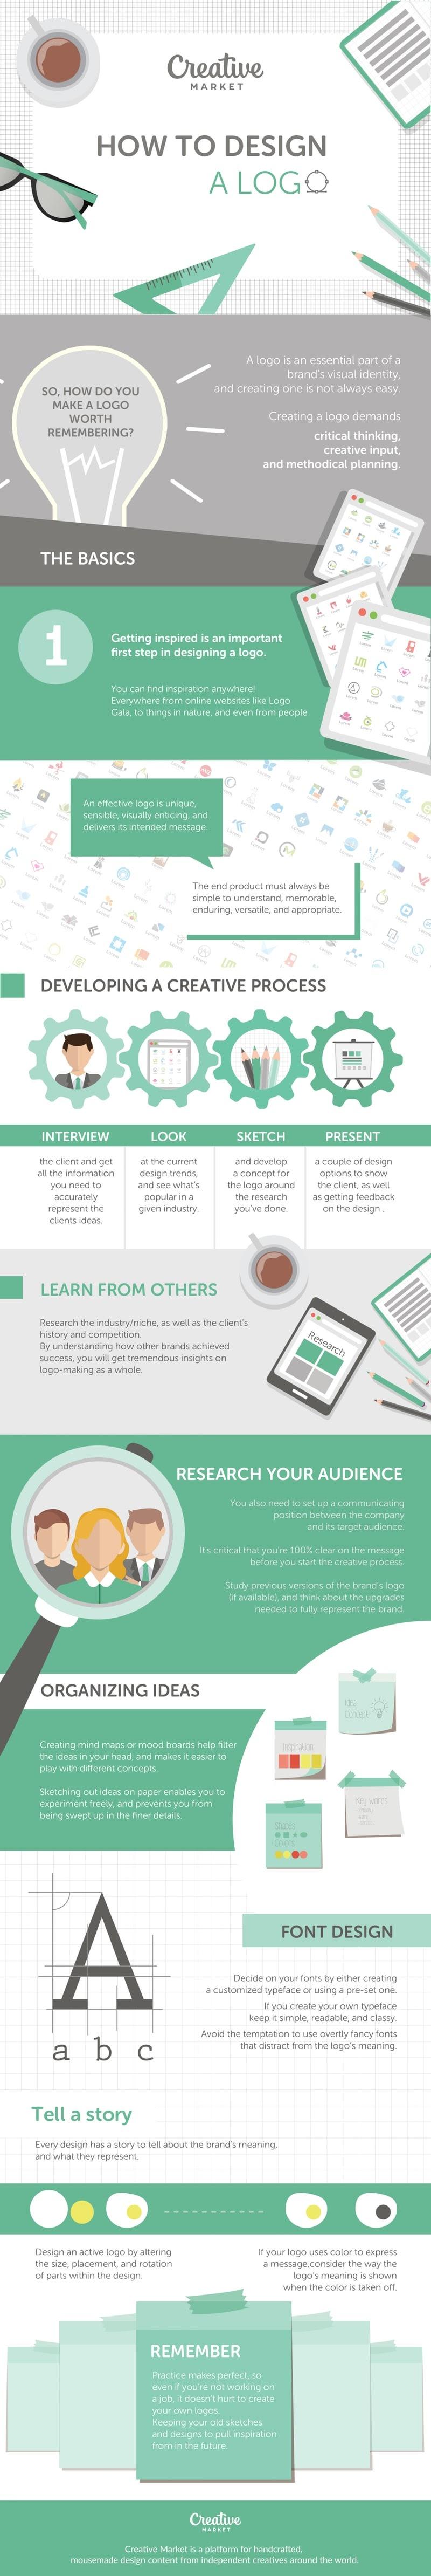 How to Design a Logo - #infographic